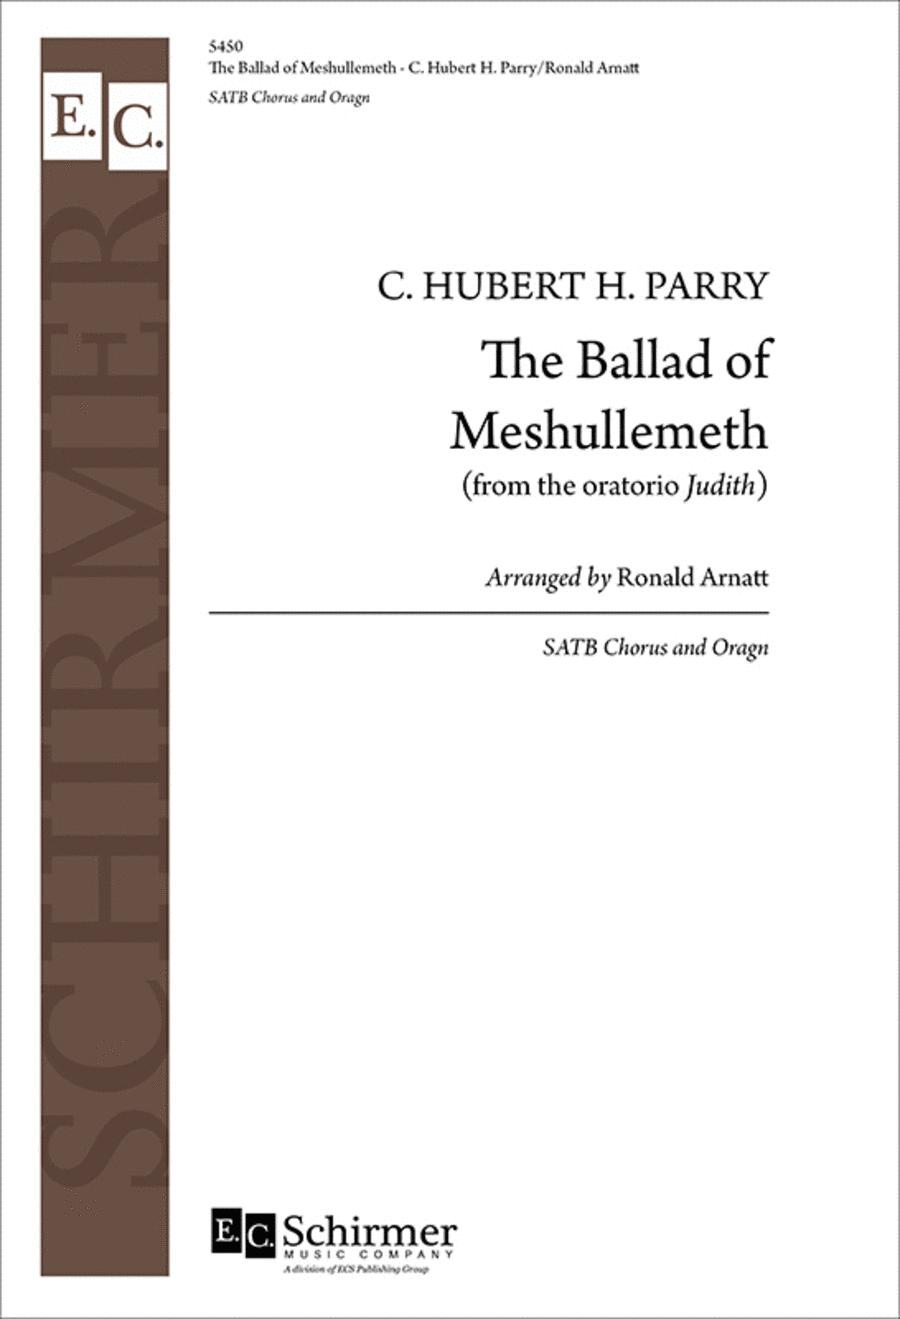 Judith: The Ballad of Meshullemeth